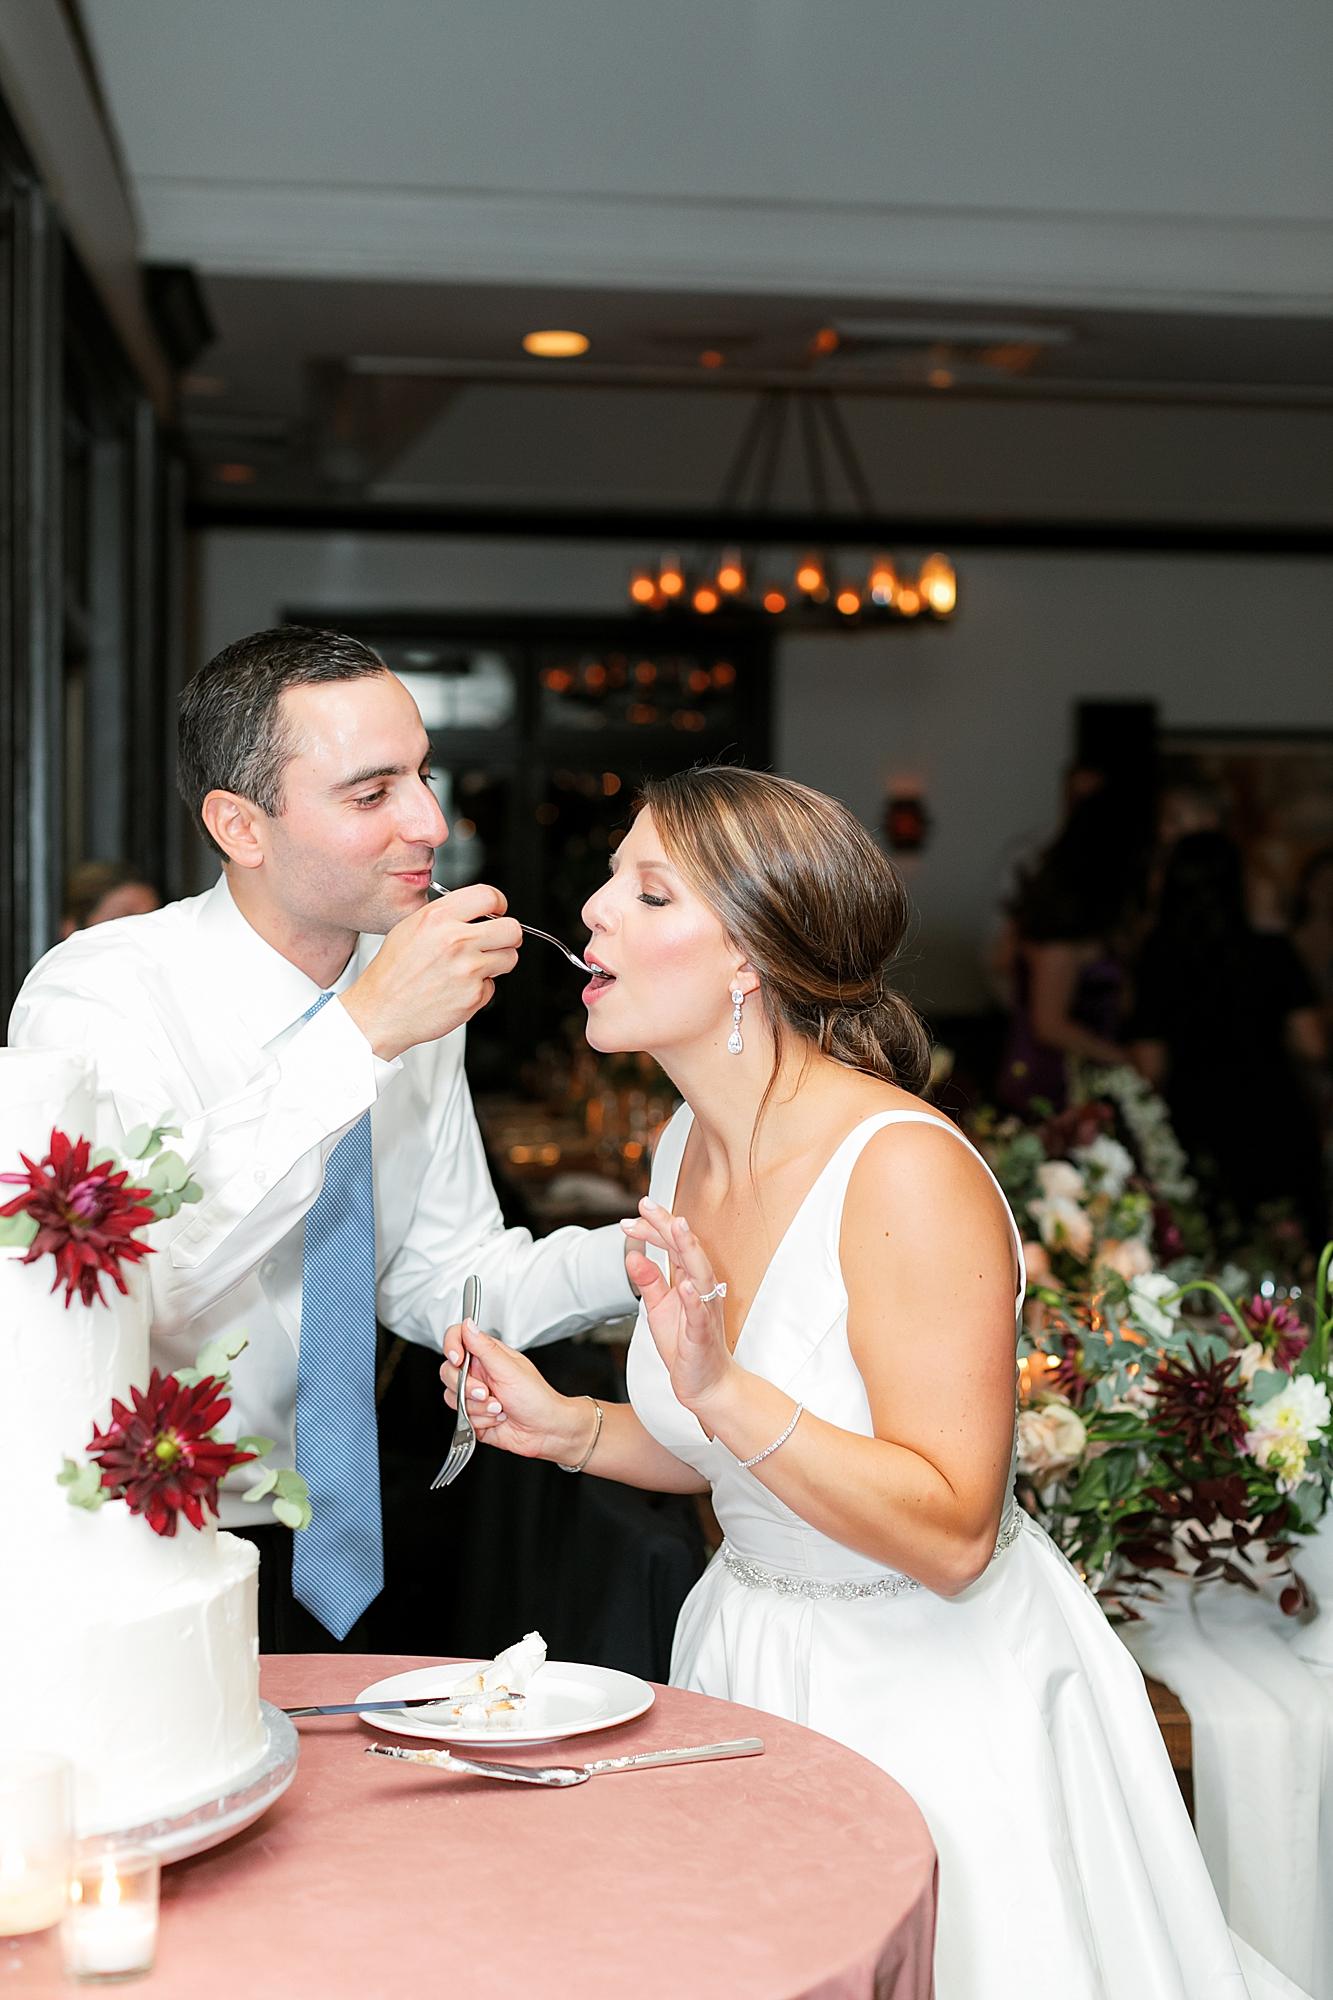 Princeton New Jersey Film Wedding Photographer Princeton University Wedding Photography by Magdalena Studios NJ Wedding Photographer66